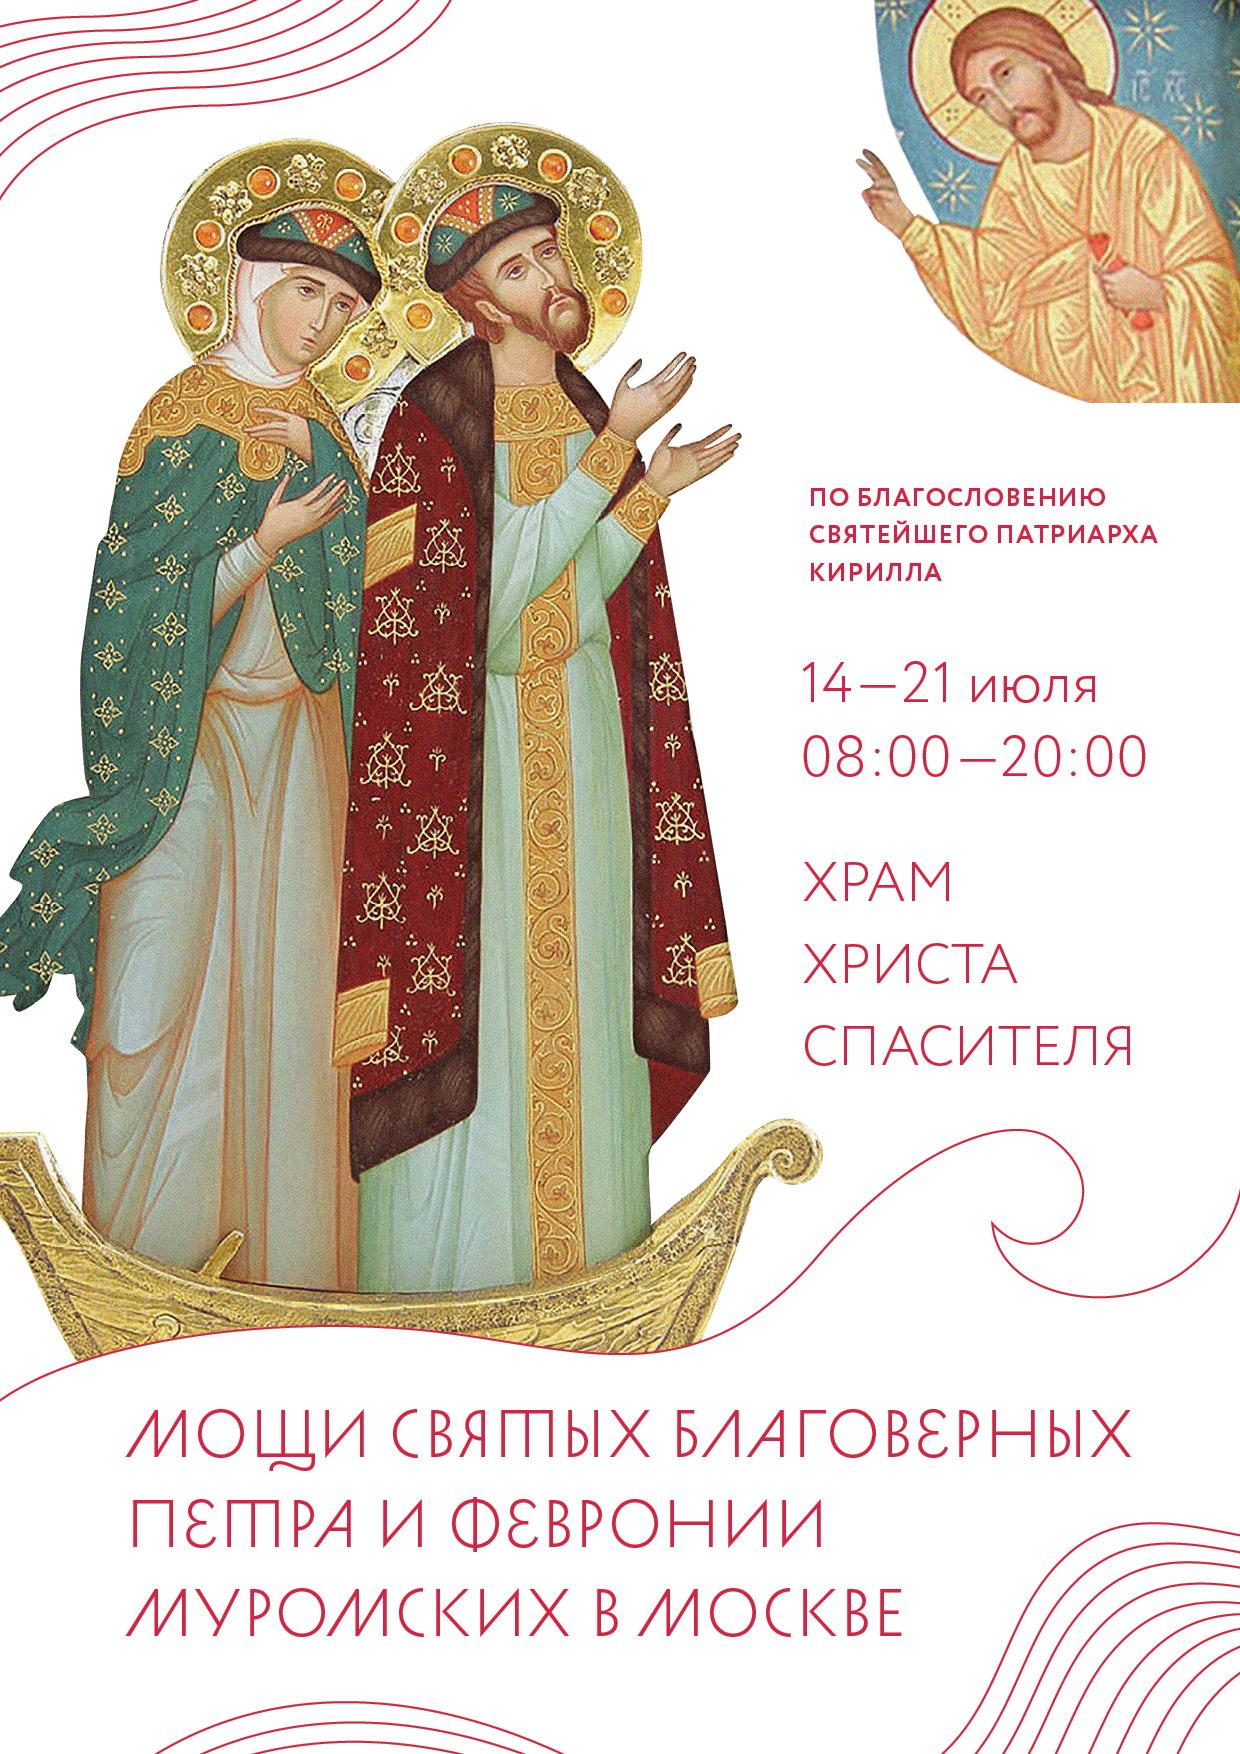 Мощи святых благоверных Петра и Февронии Муромских в храме Христа Спасителя